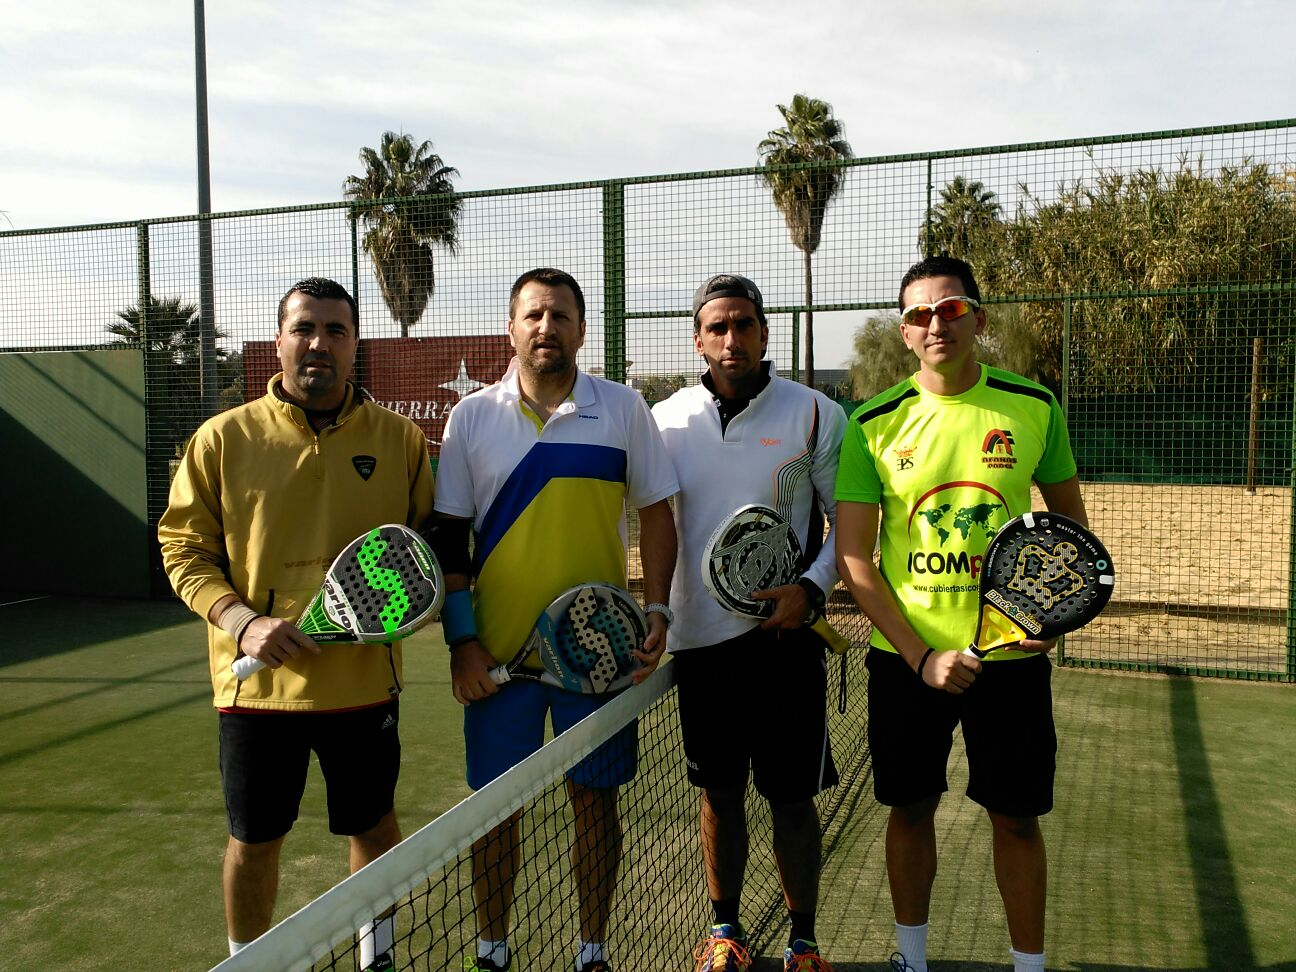 Final de Pádel +40: Jorge Bocanegra, José M. Lara, A. Martínez 'Chone' y Fernando Iriart